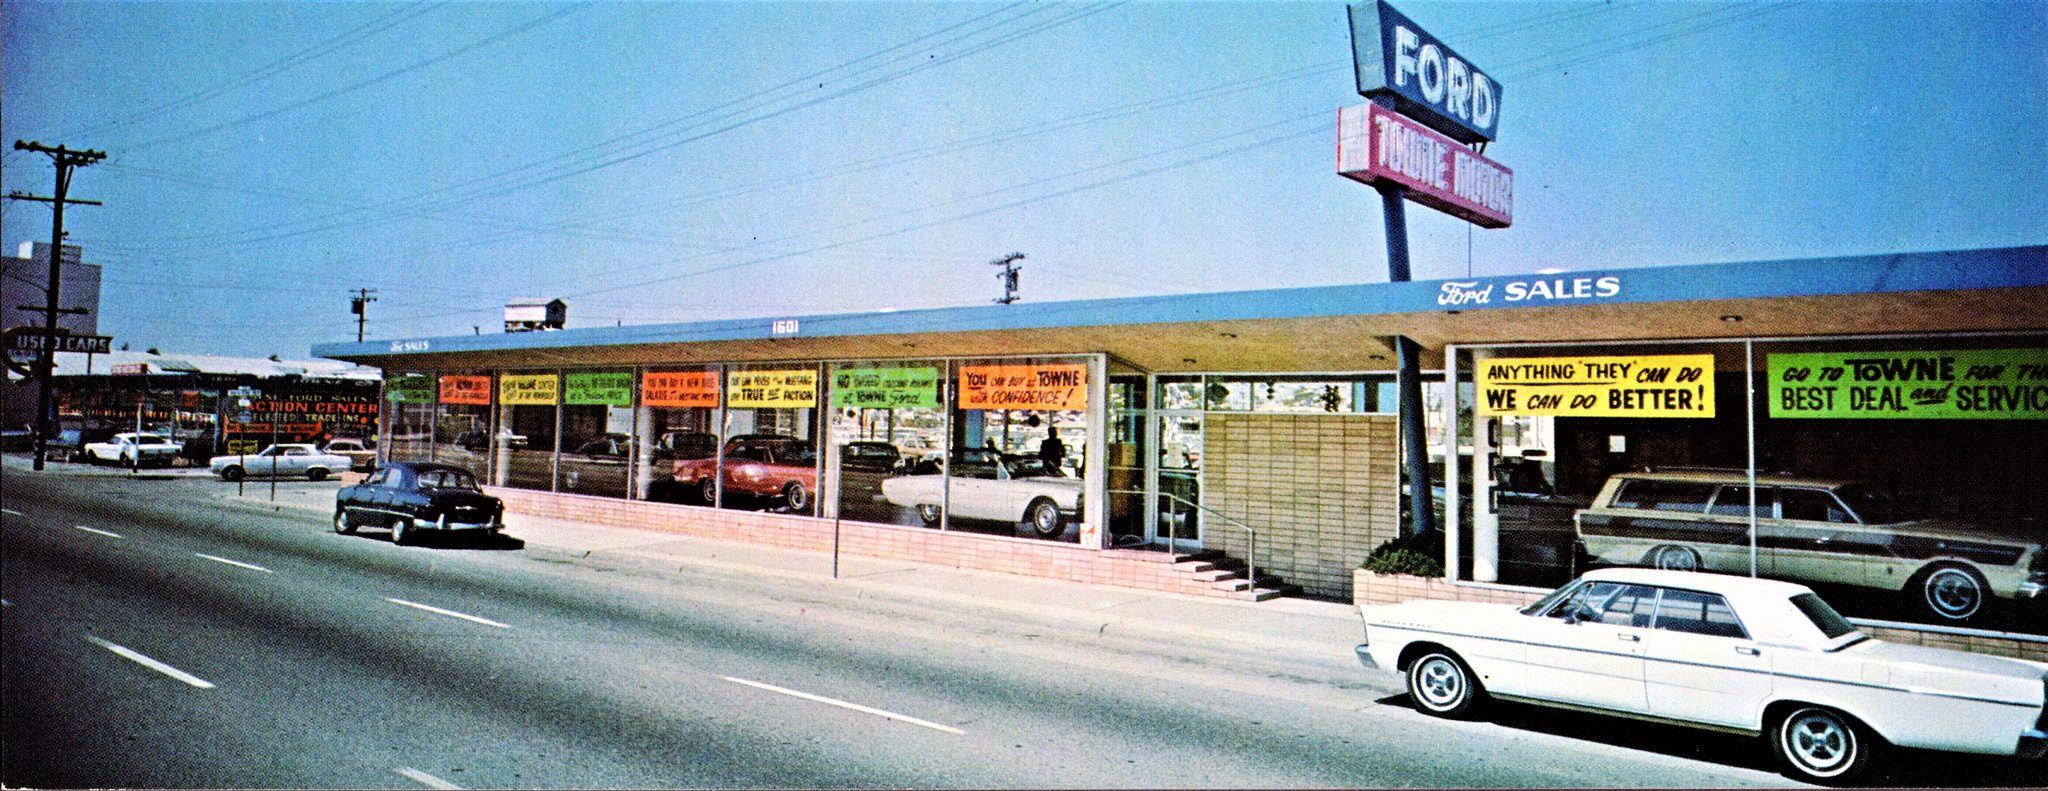 1965 Towne Ford Sales Dealership, Redwood City, California